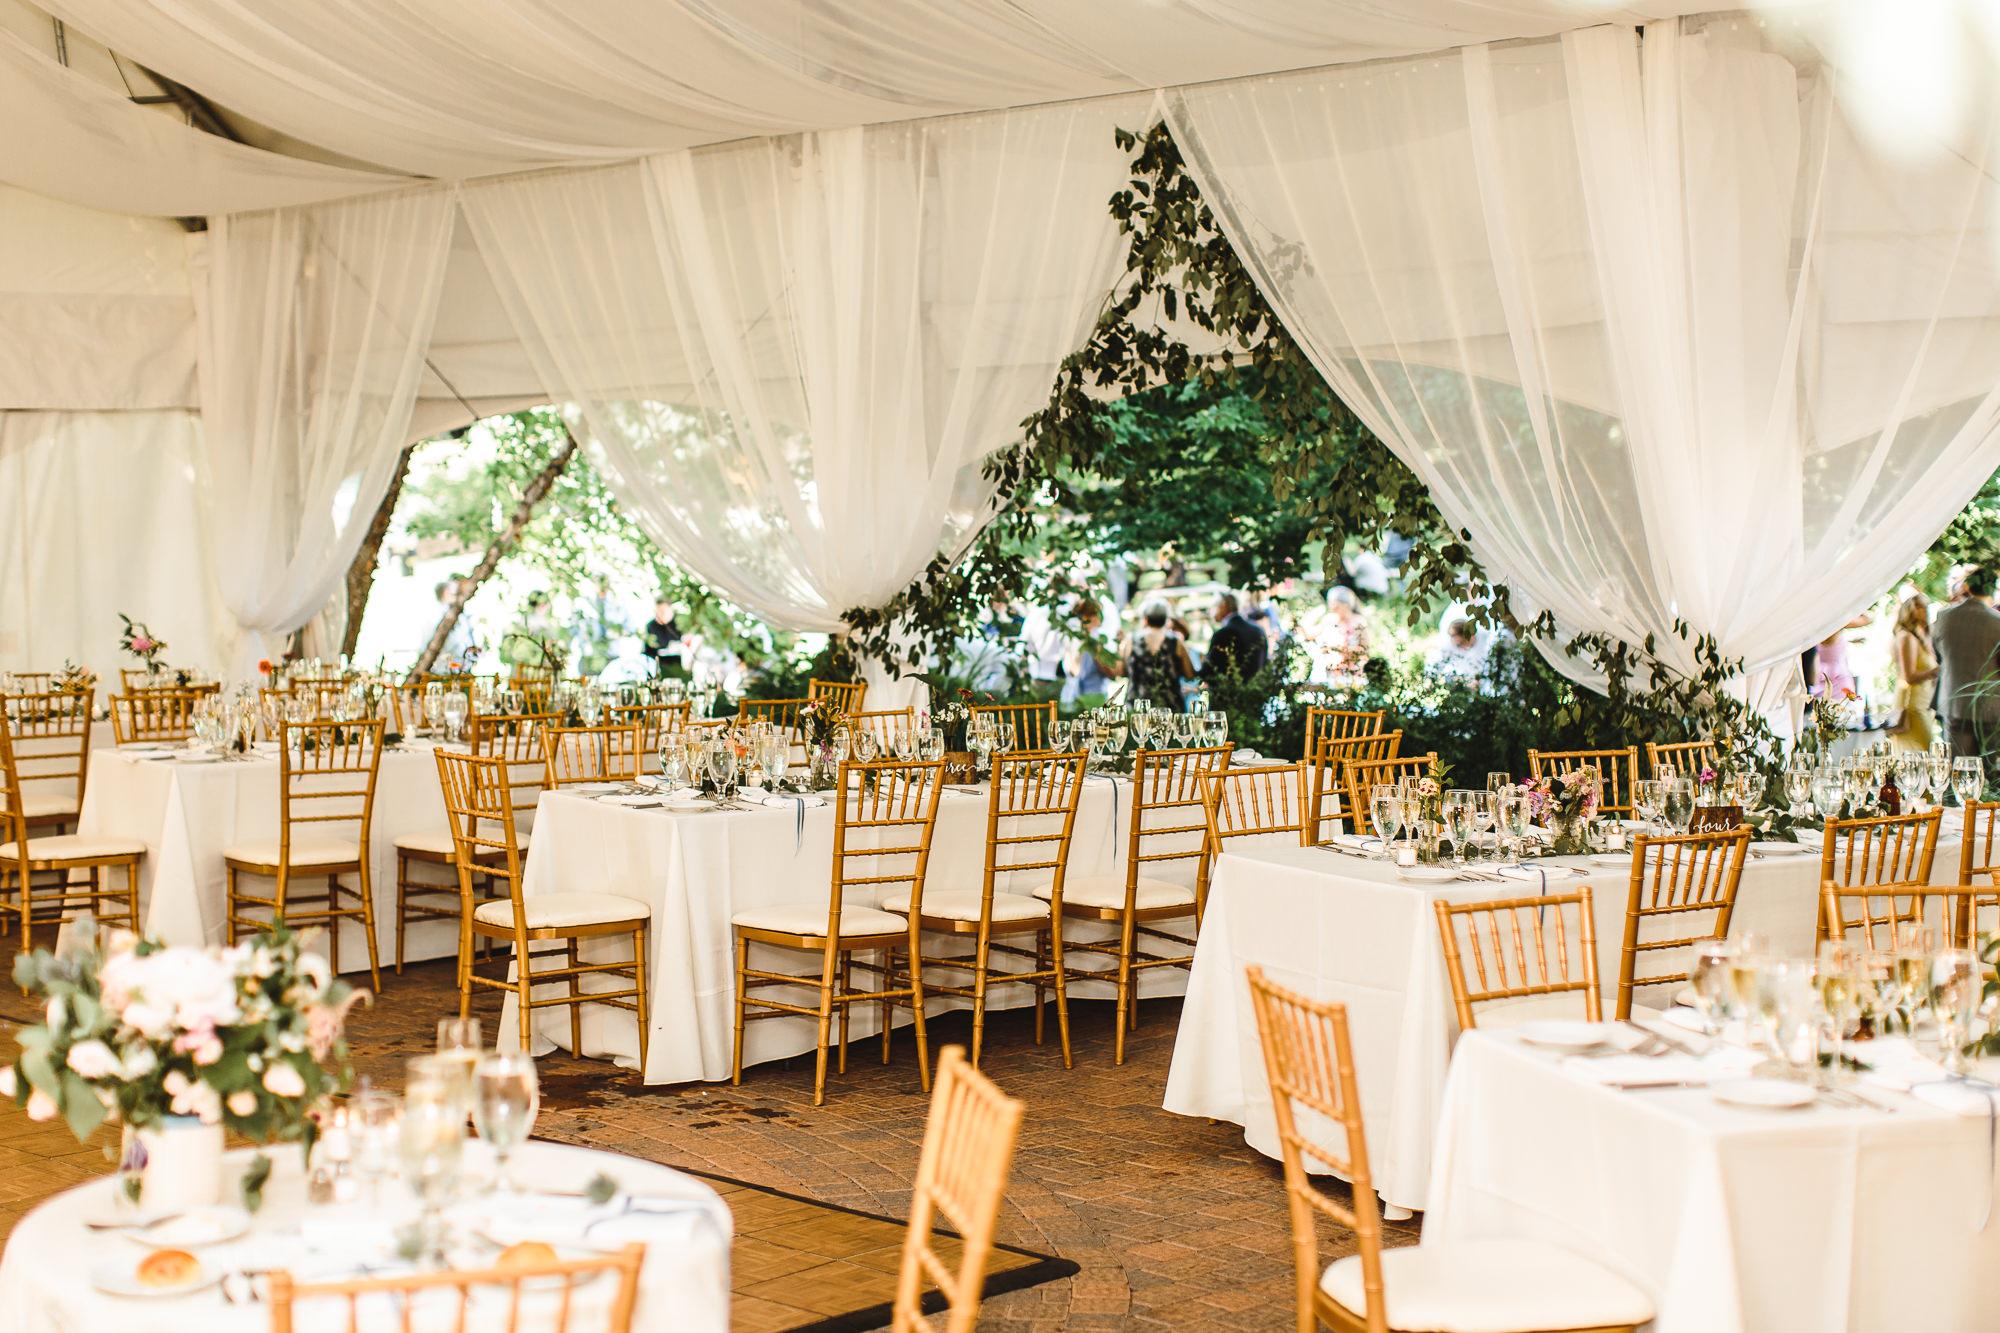 connecticut-summer-lake-wedding-emily-kirke-photography-upstyle (125 of 181).jpg